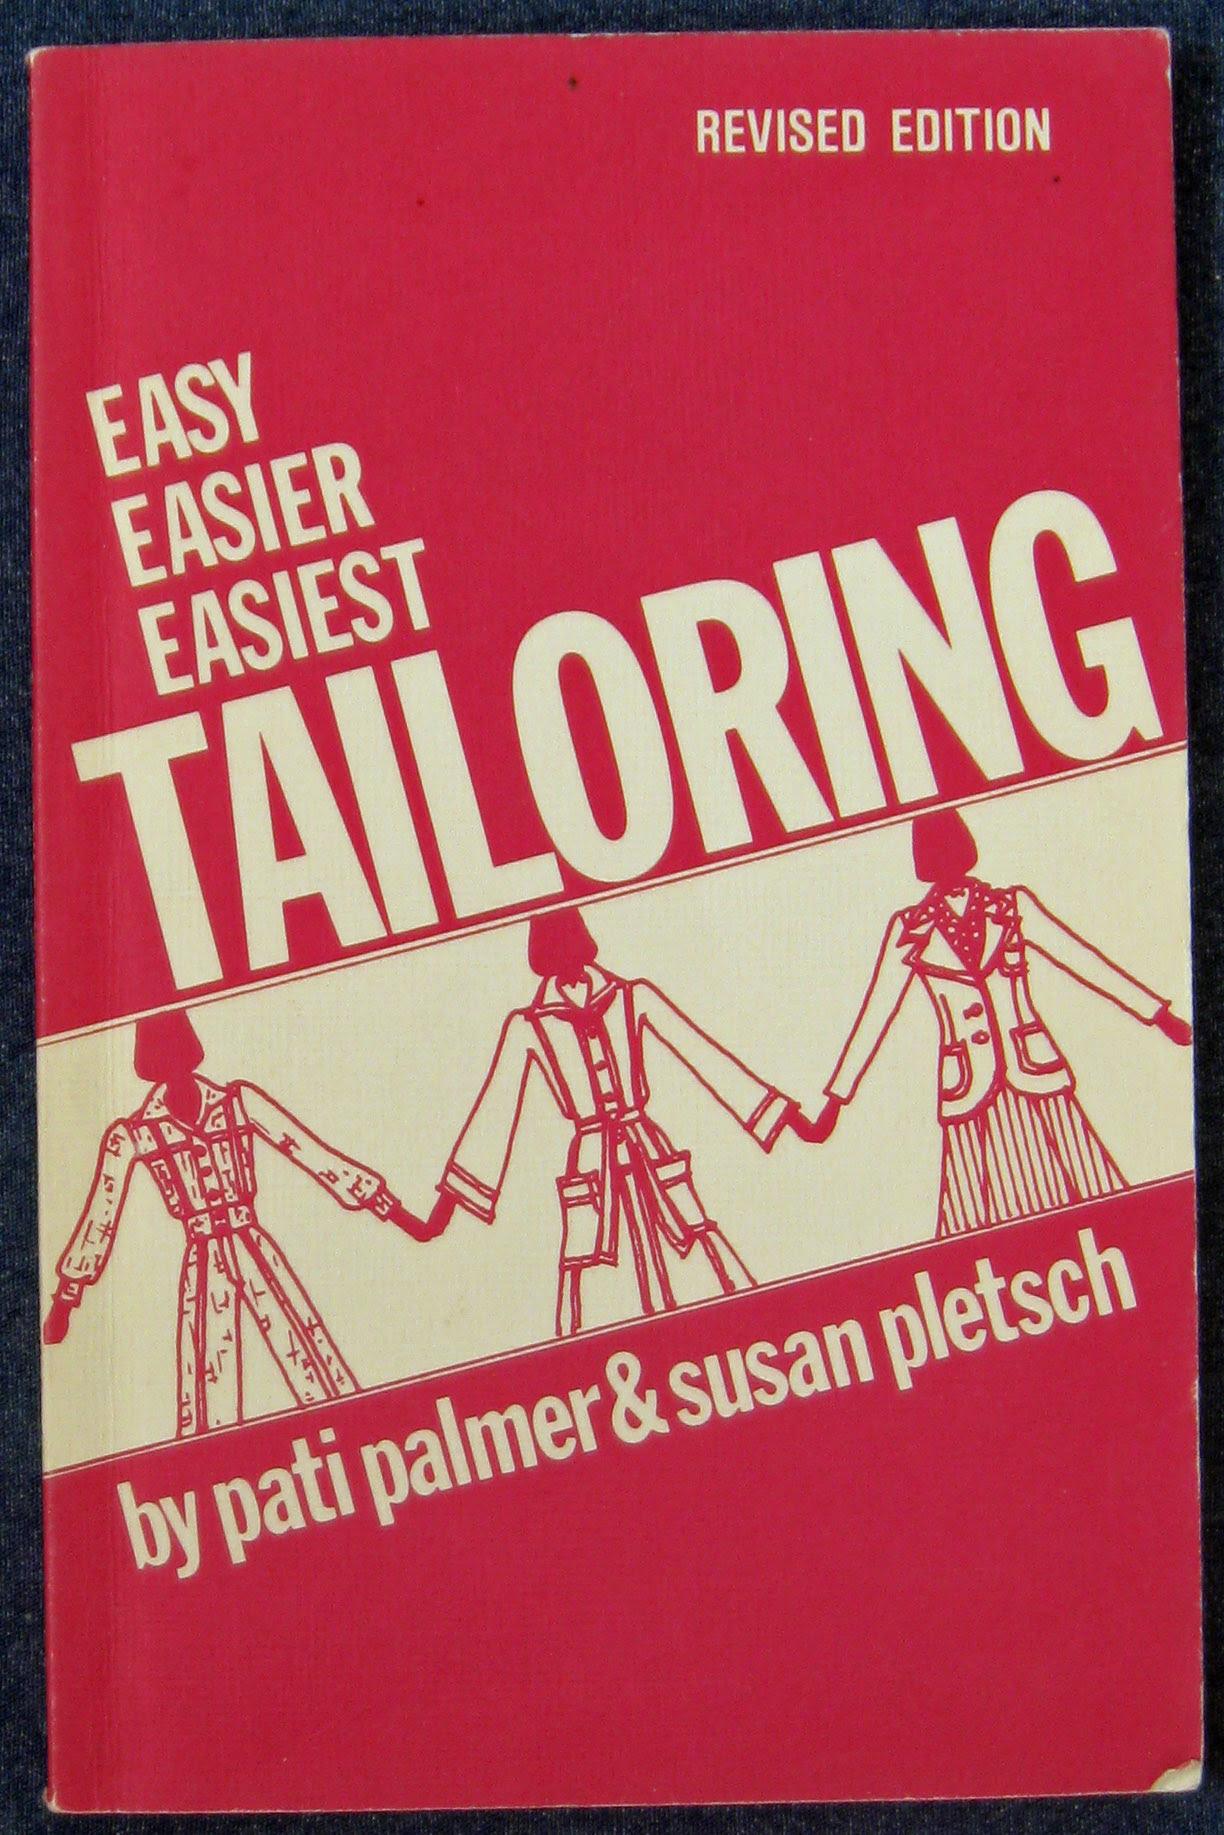 Palmer book cover